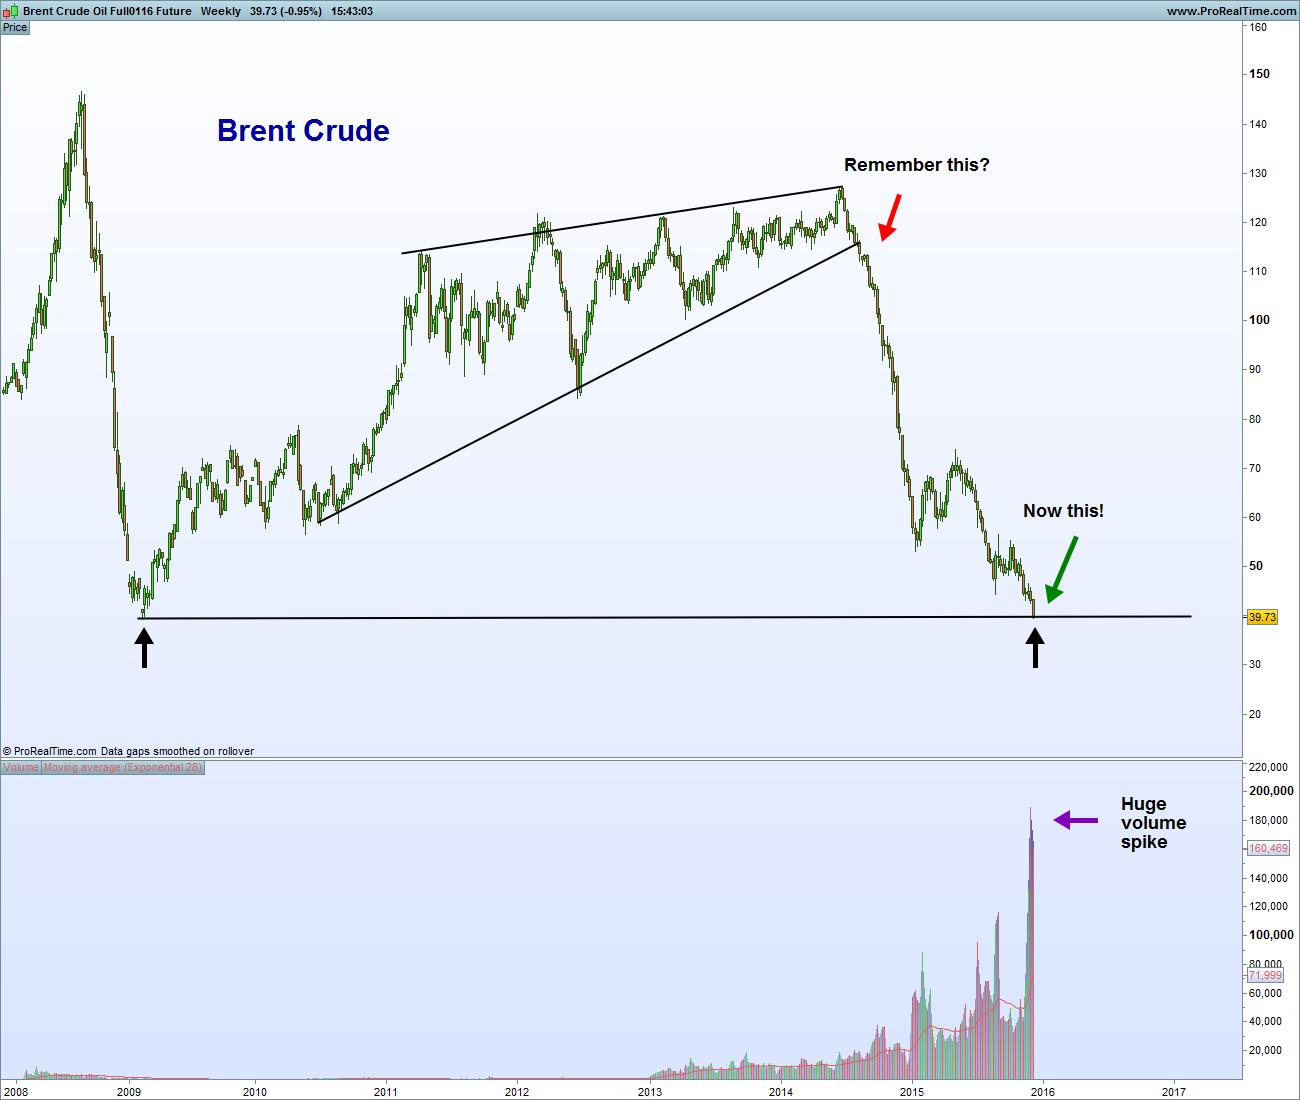 Brent Crude Oil Full0116 Future